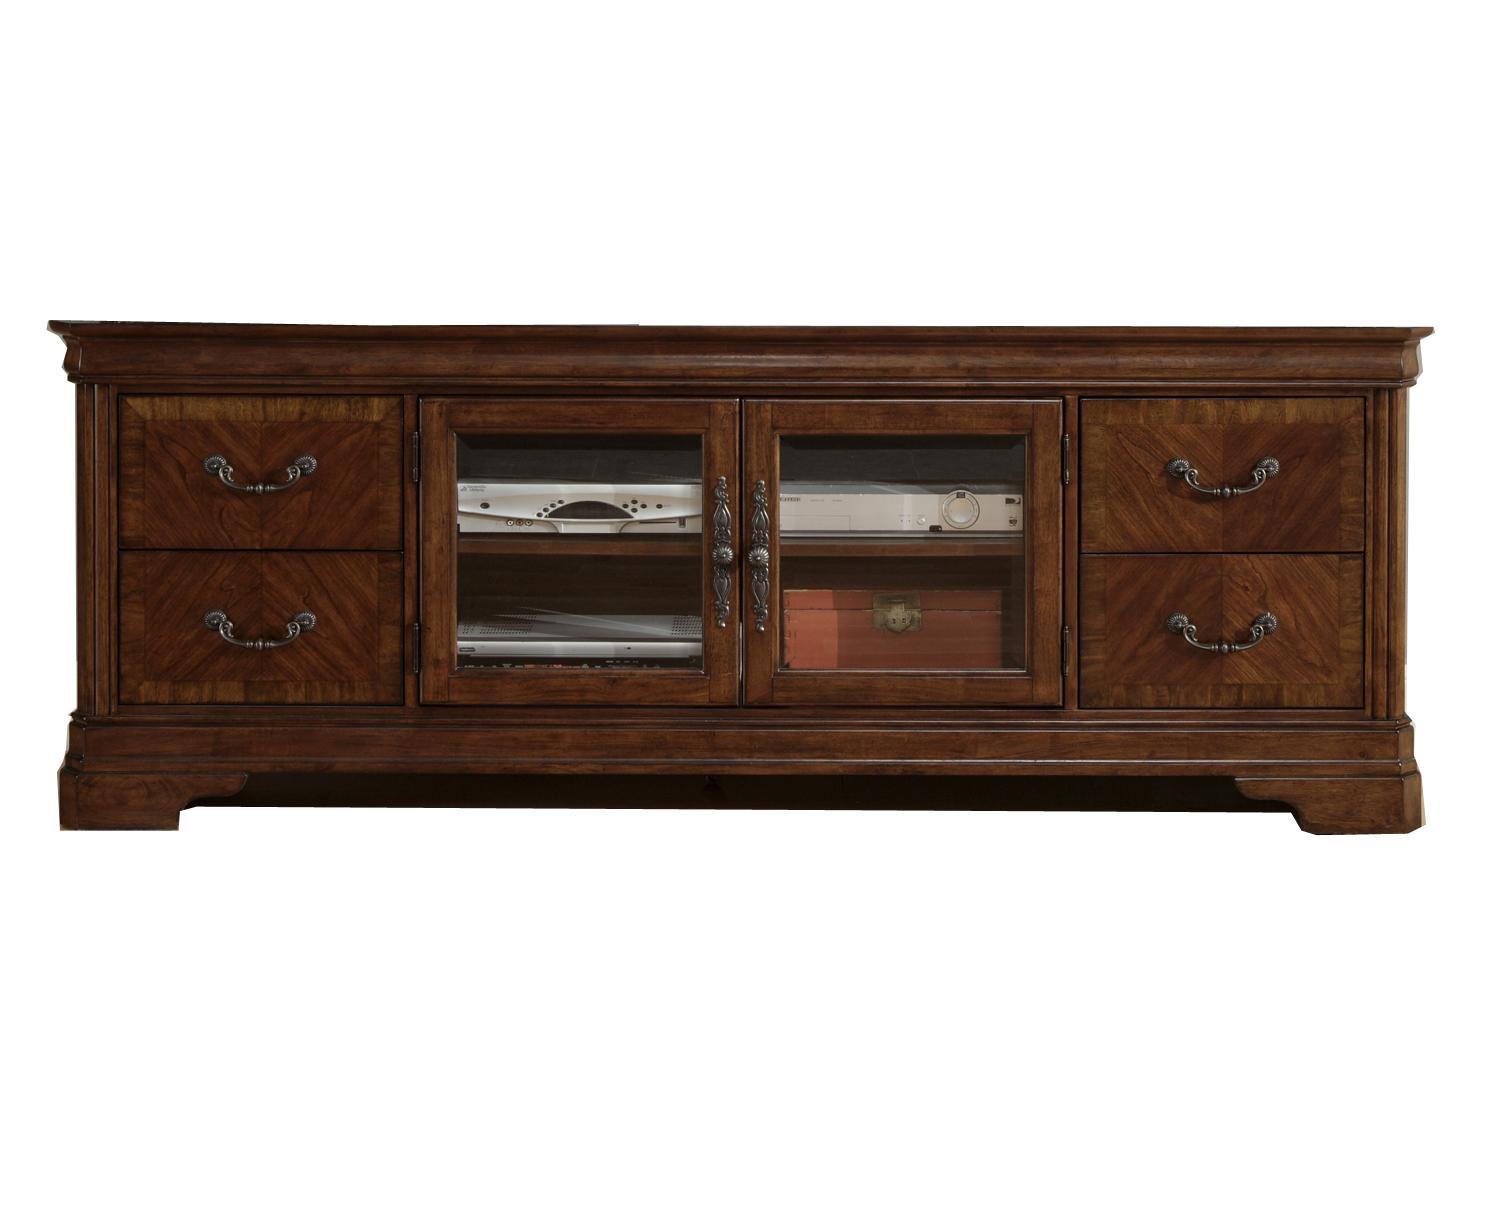 Liberty Furniture Alexandria 722-TV00 2 Door Entertainment